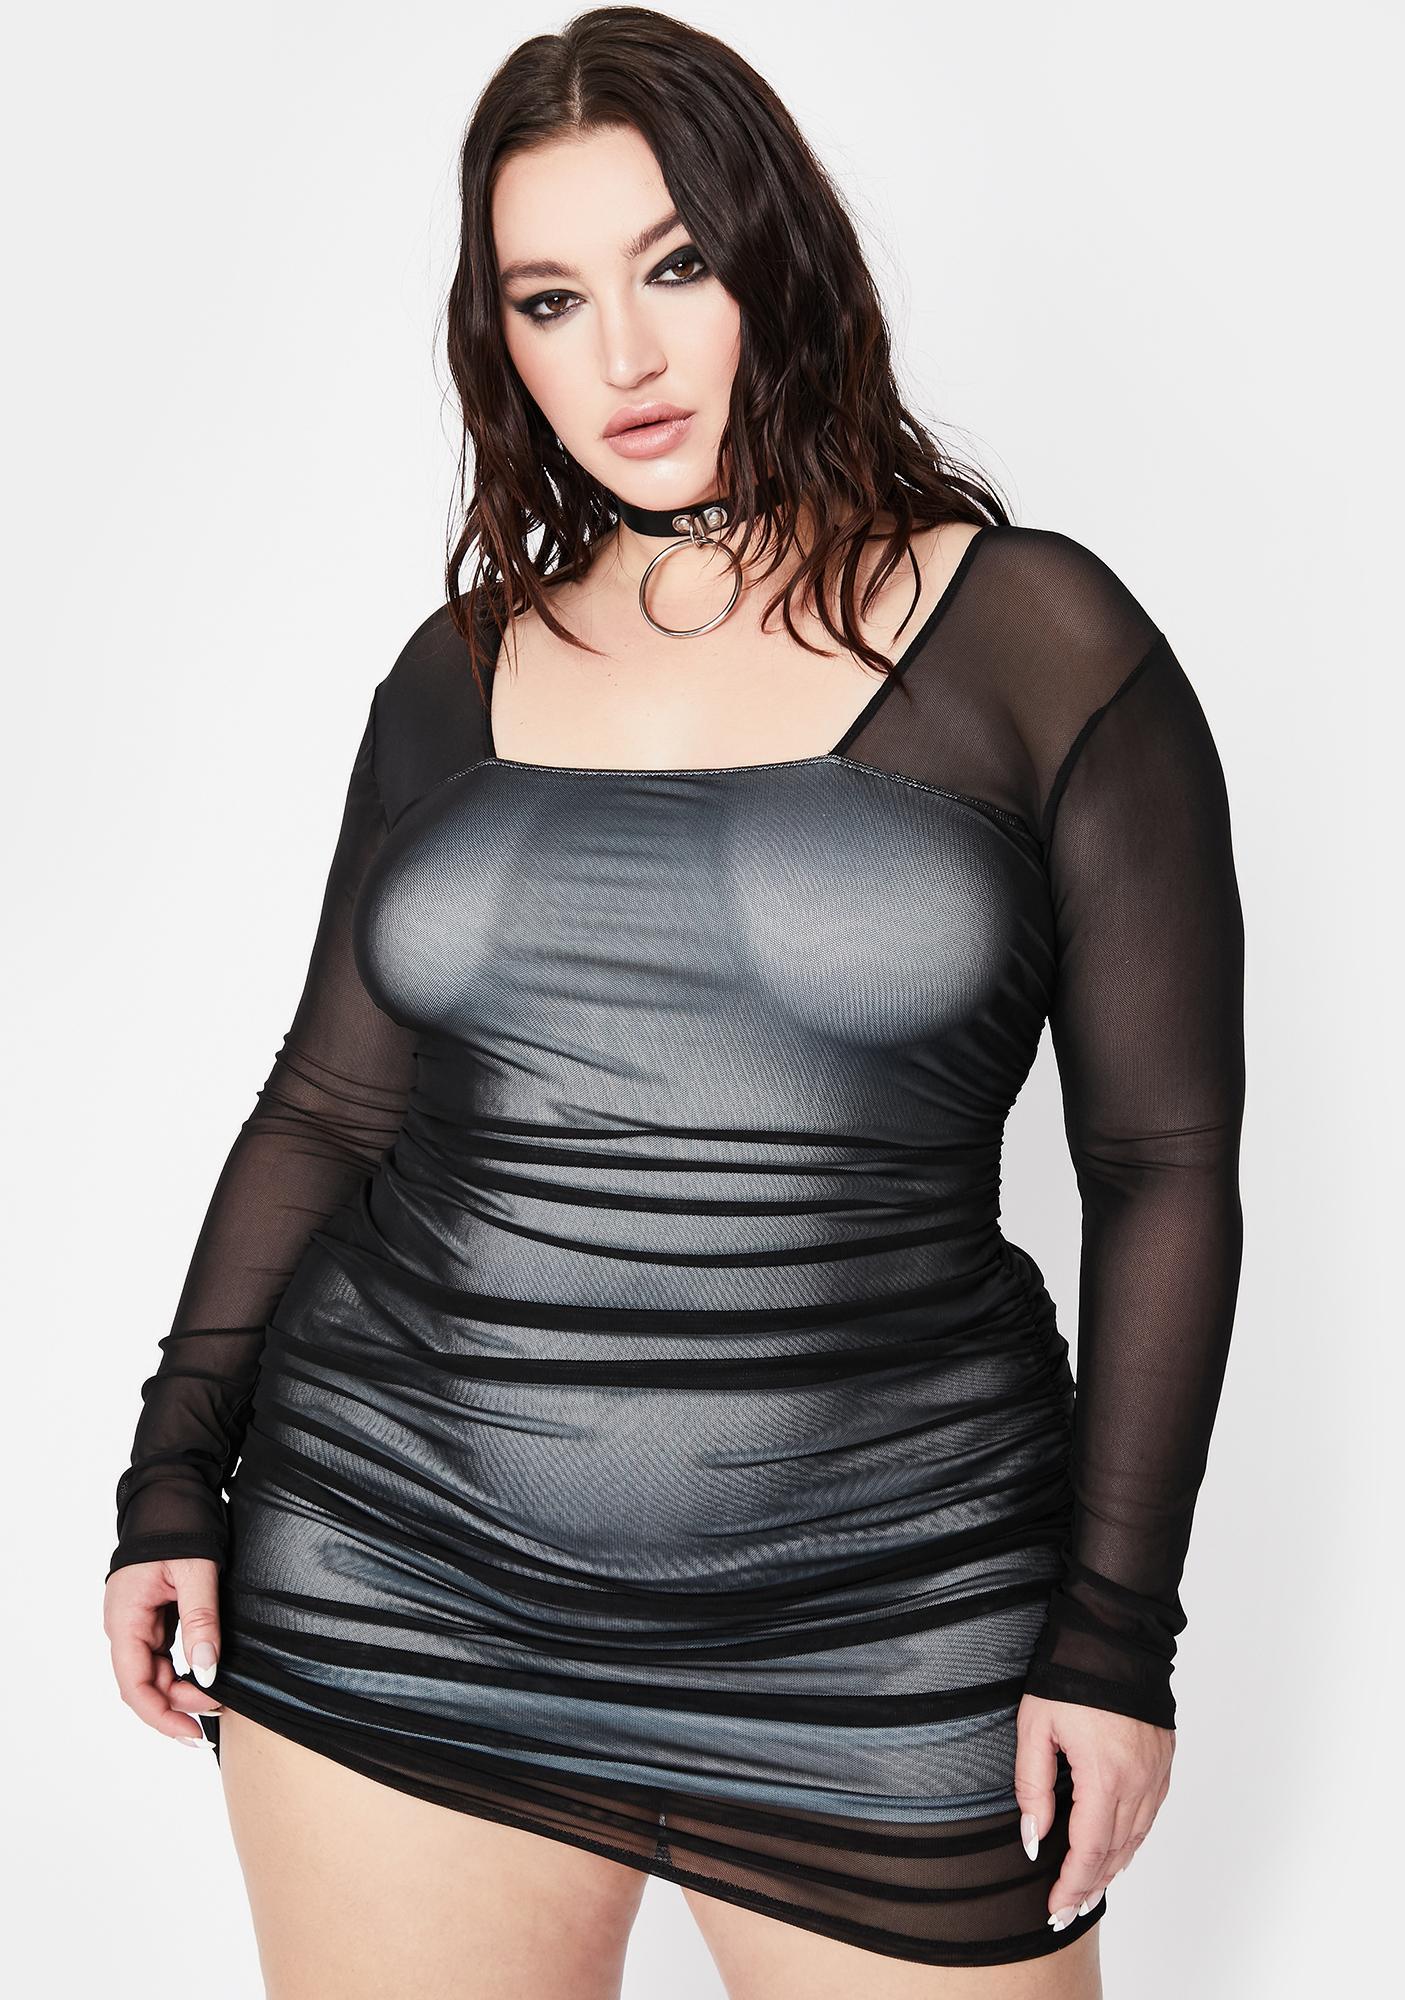 Current Mood Got Rough Luck Ruched Dress